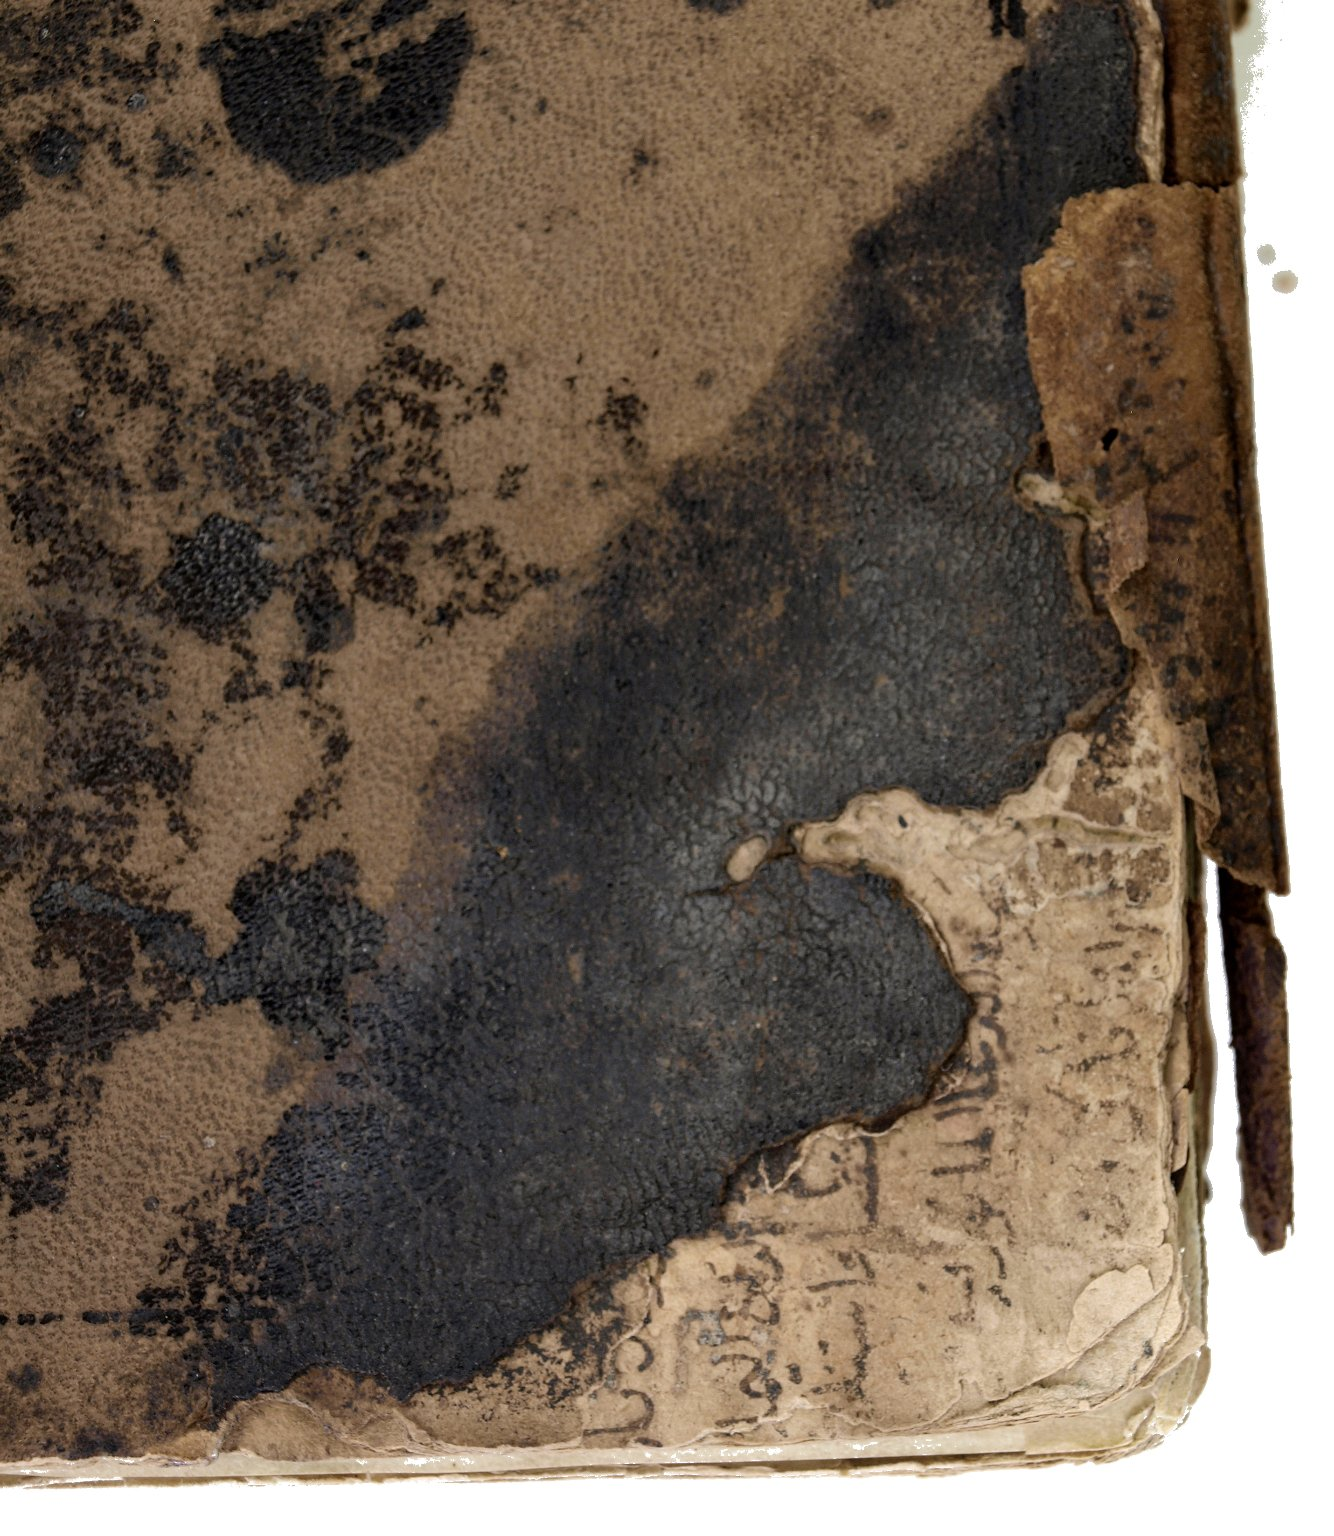 Manuscript inside boards (detail), V.b.315.